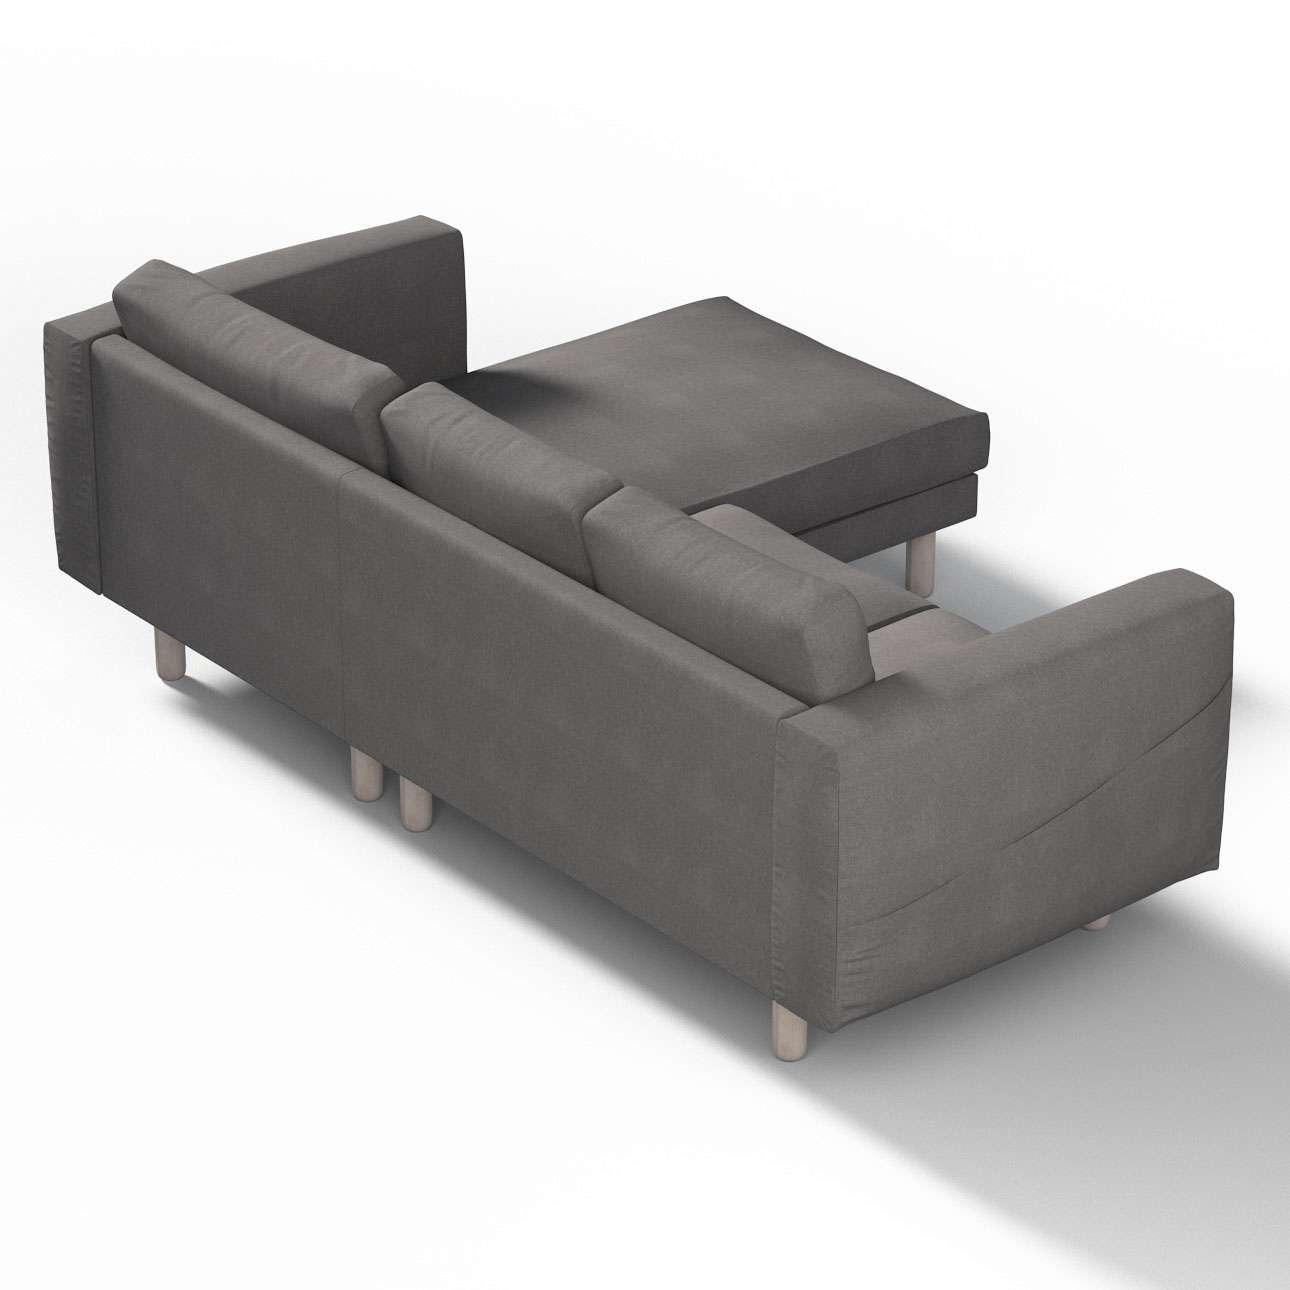 norsborg bezug f r 3 sitzer sofa mit recamiere dunkelgrau dekoria. Black Bedroom Furniture Sets. Home Design Ideas